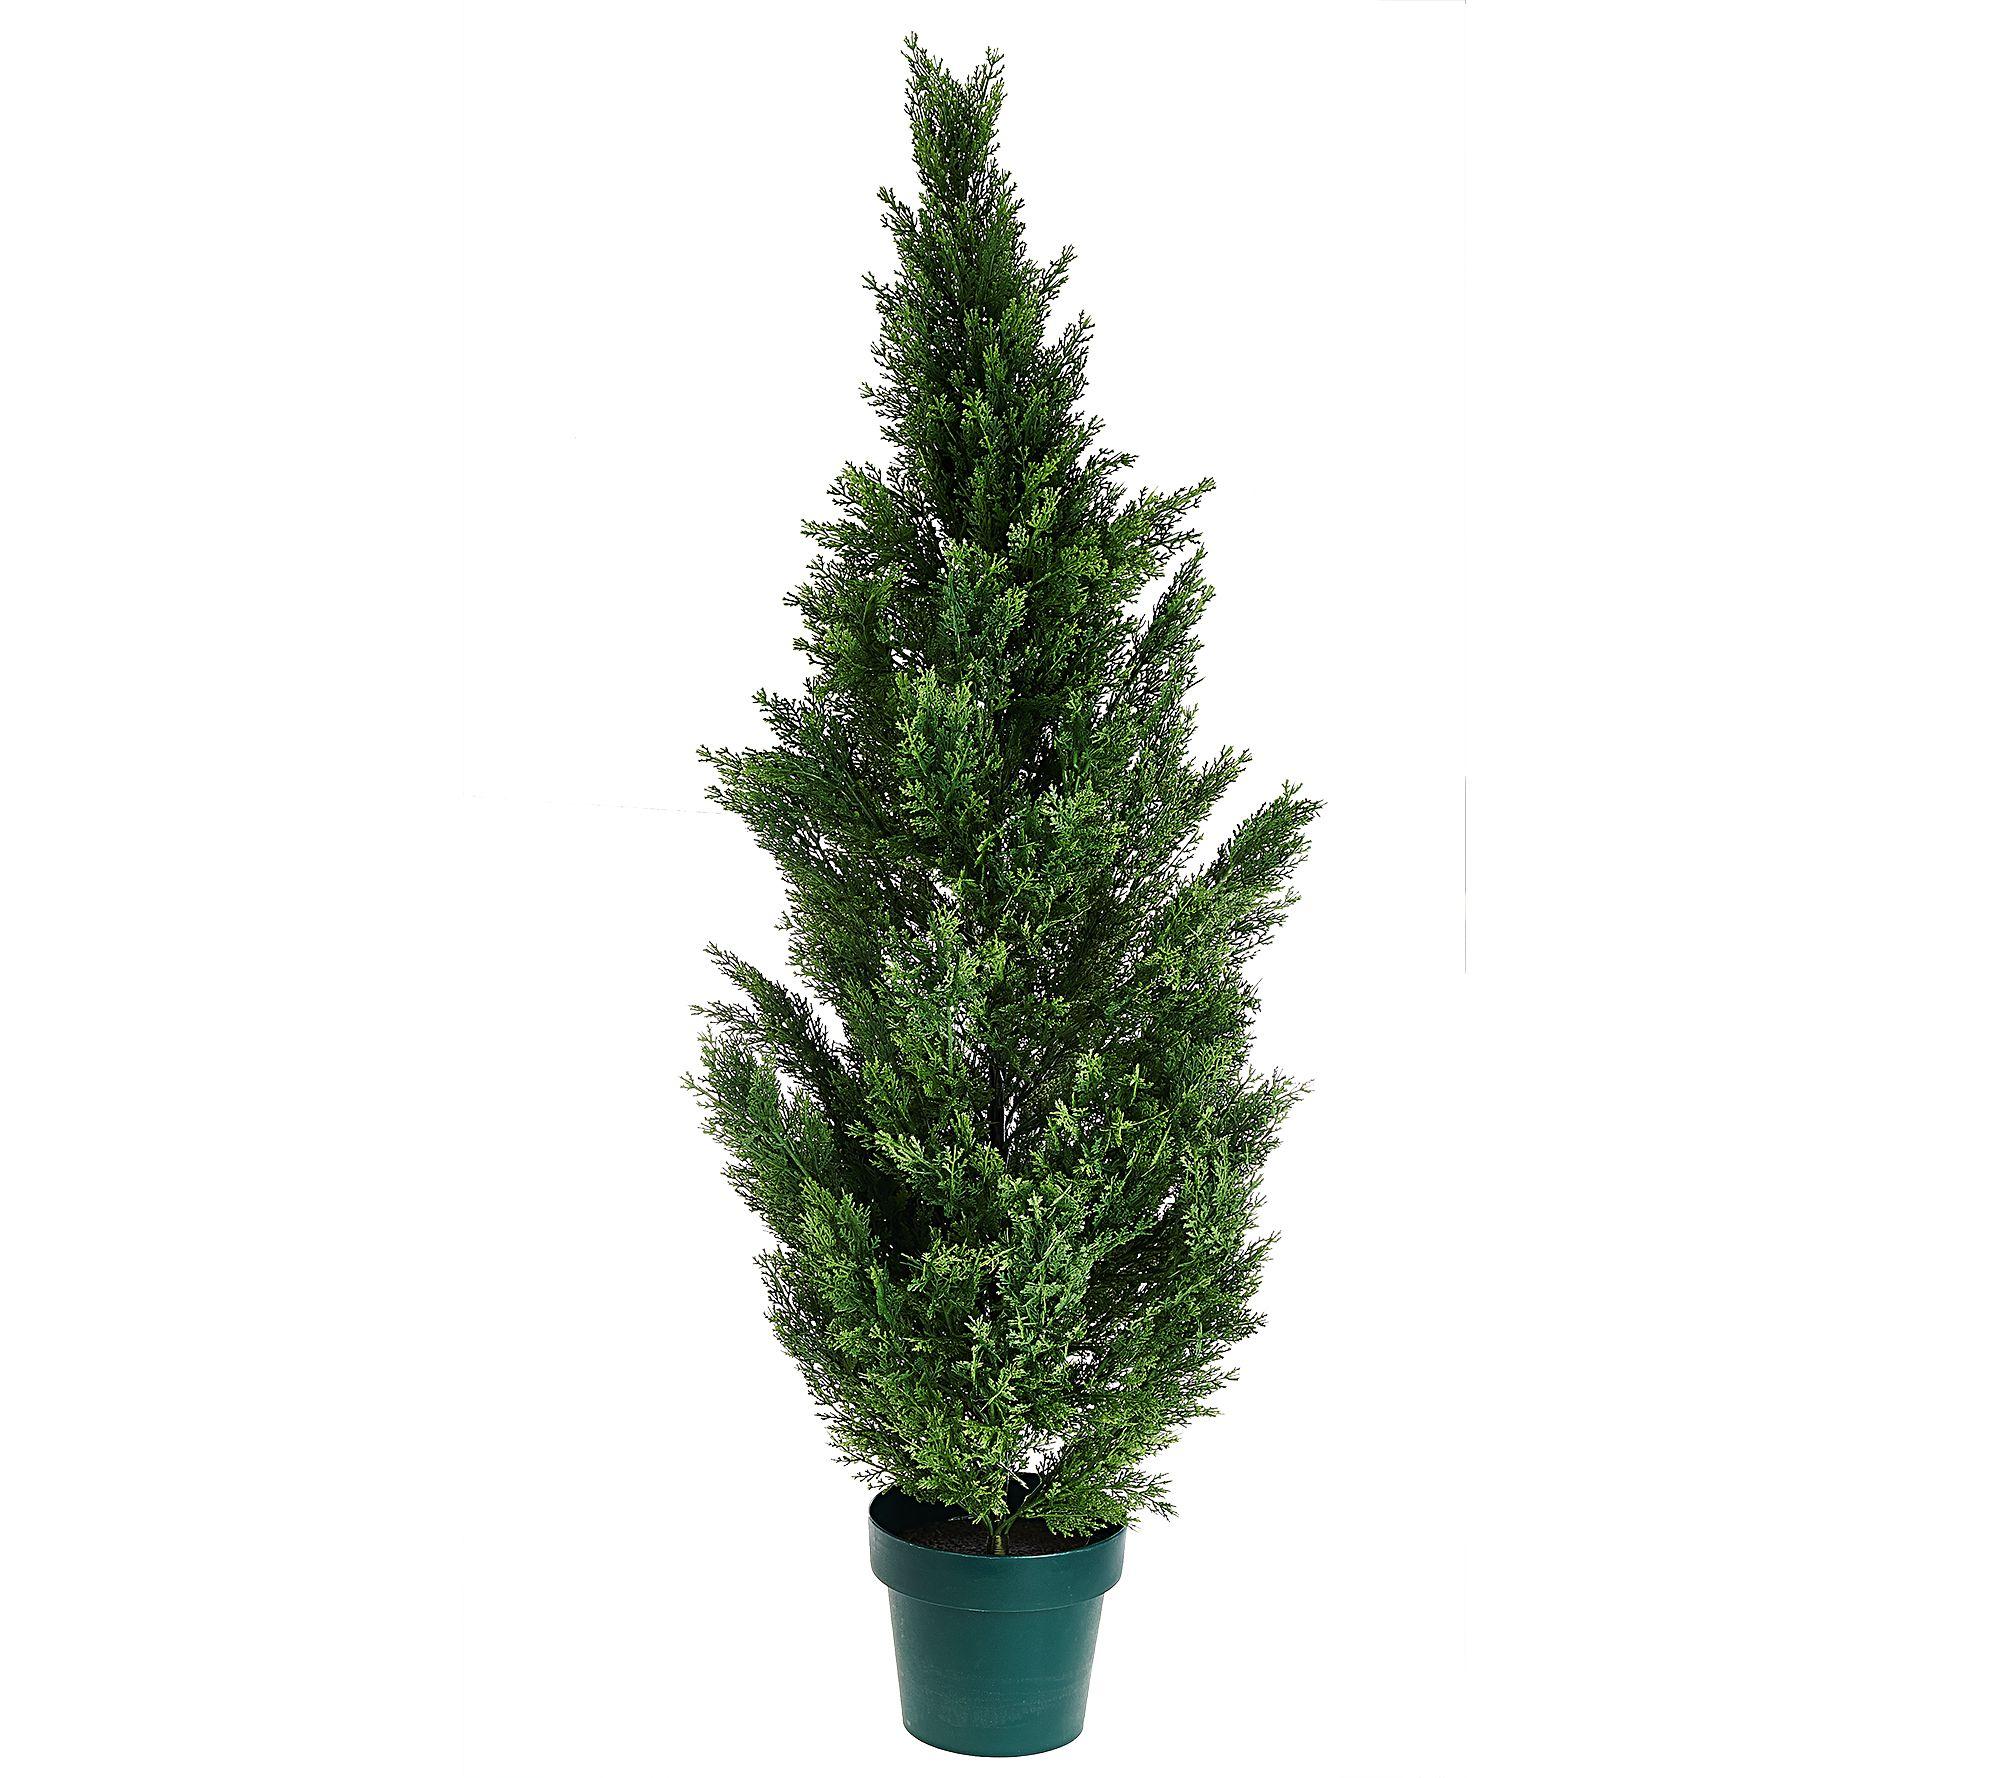 Real Live Christmas Trees For Sale